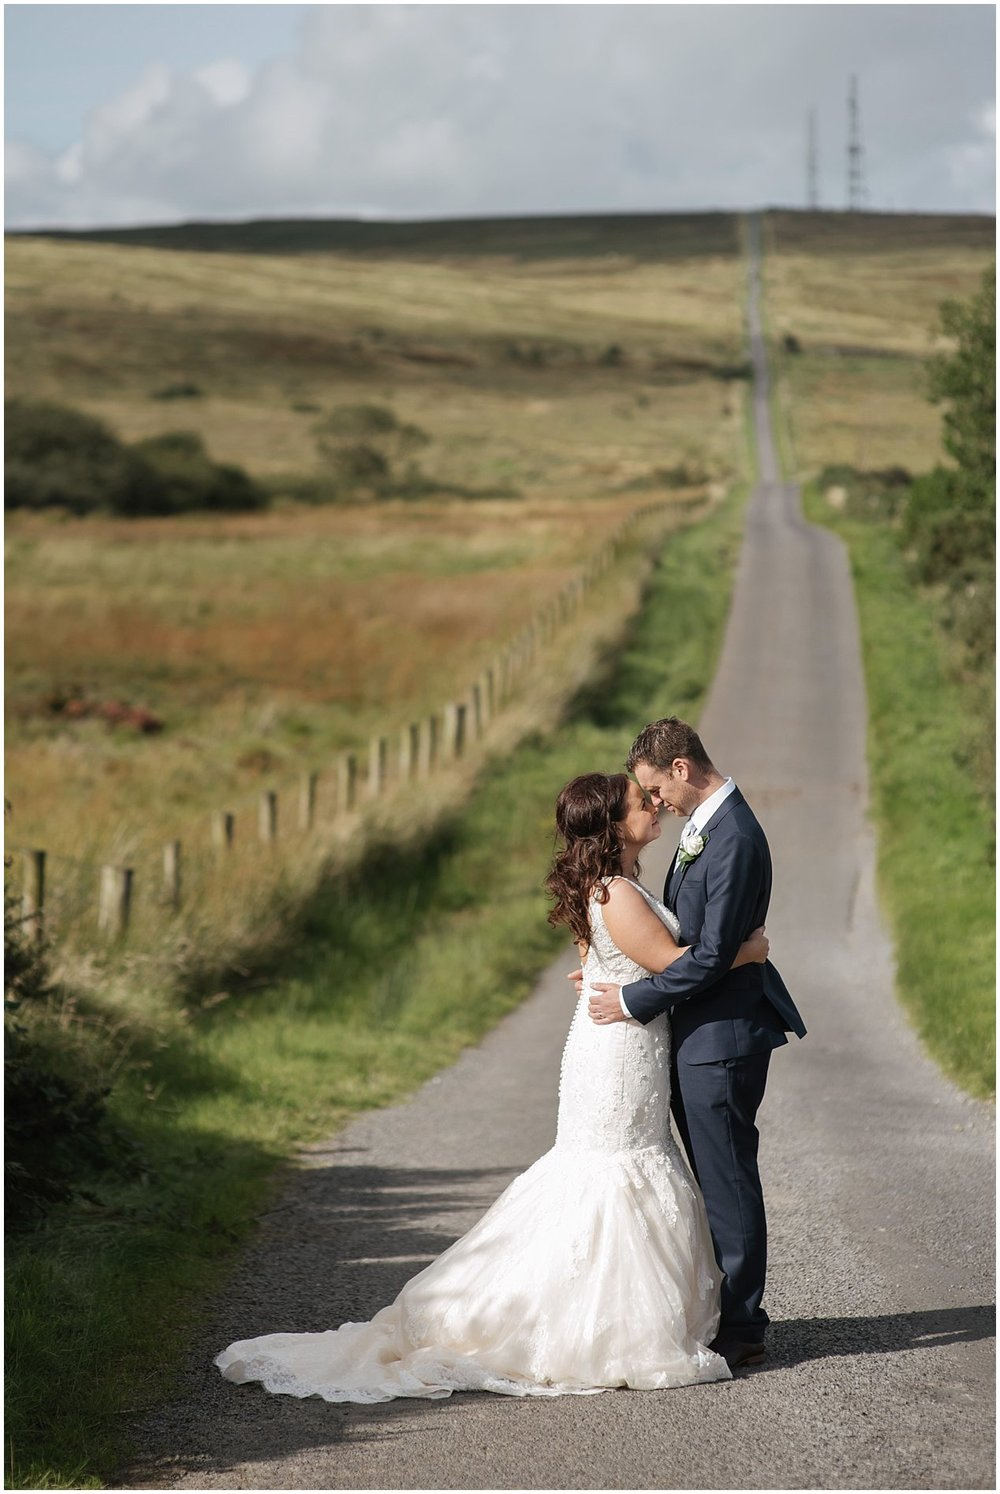 Shauneen_PJ_Hillgrove_Hotel_Monaghan_Wedding_jude_browne_photography_0055.jpg